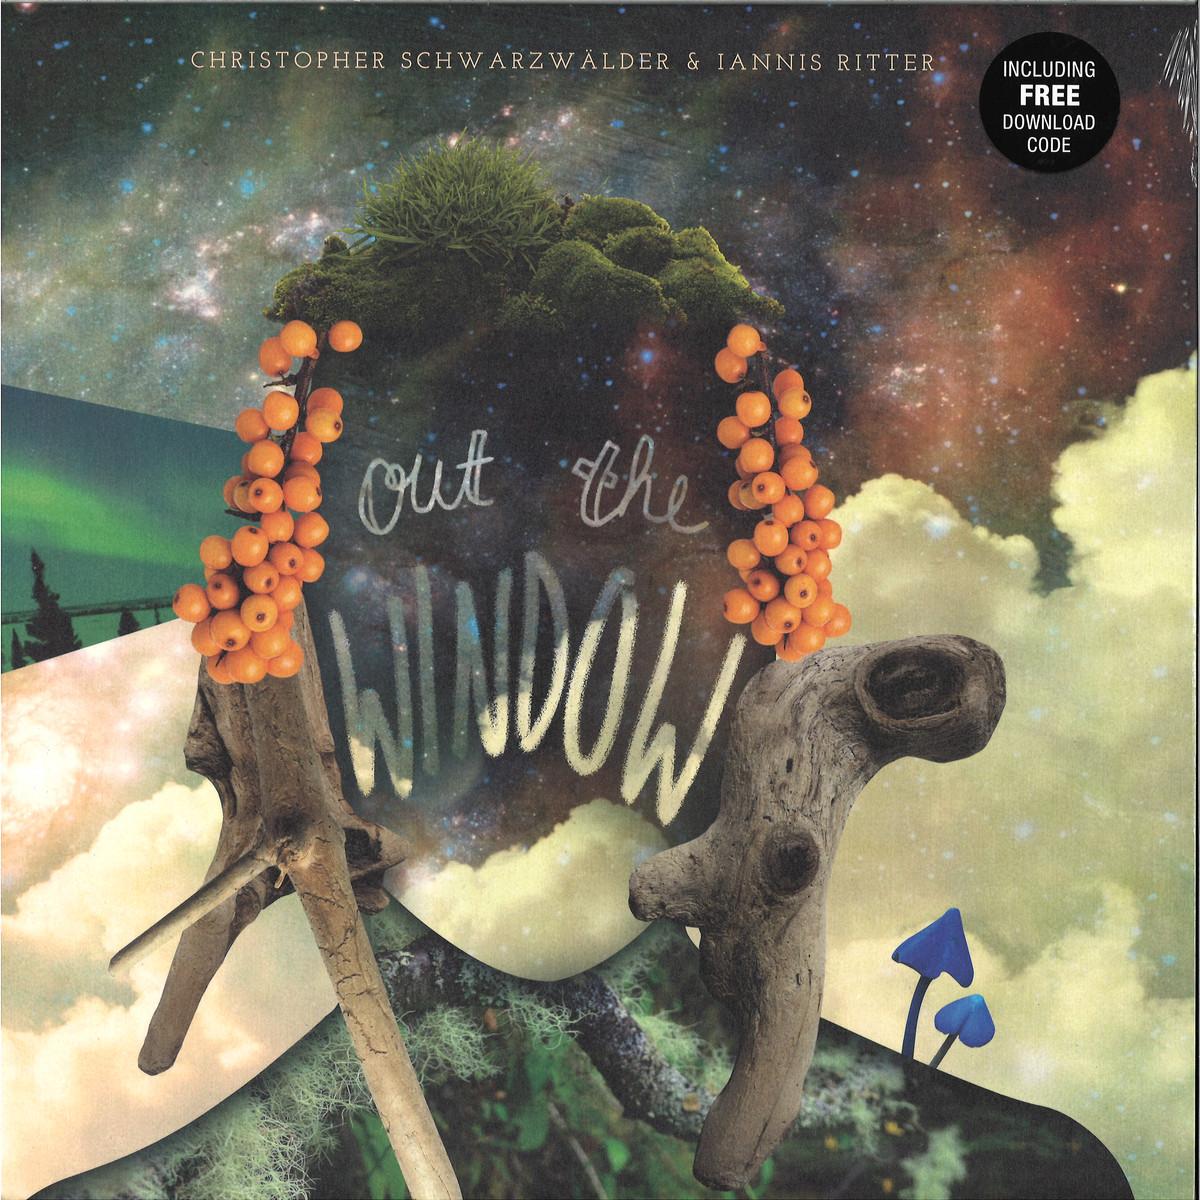 Christopher Schwarzwälder & Iannis Ritter share new downtempo track 'Colder' ile ilgili görsel sonucu